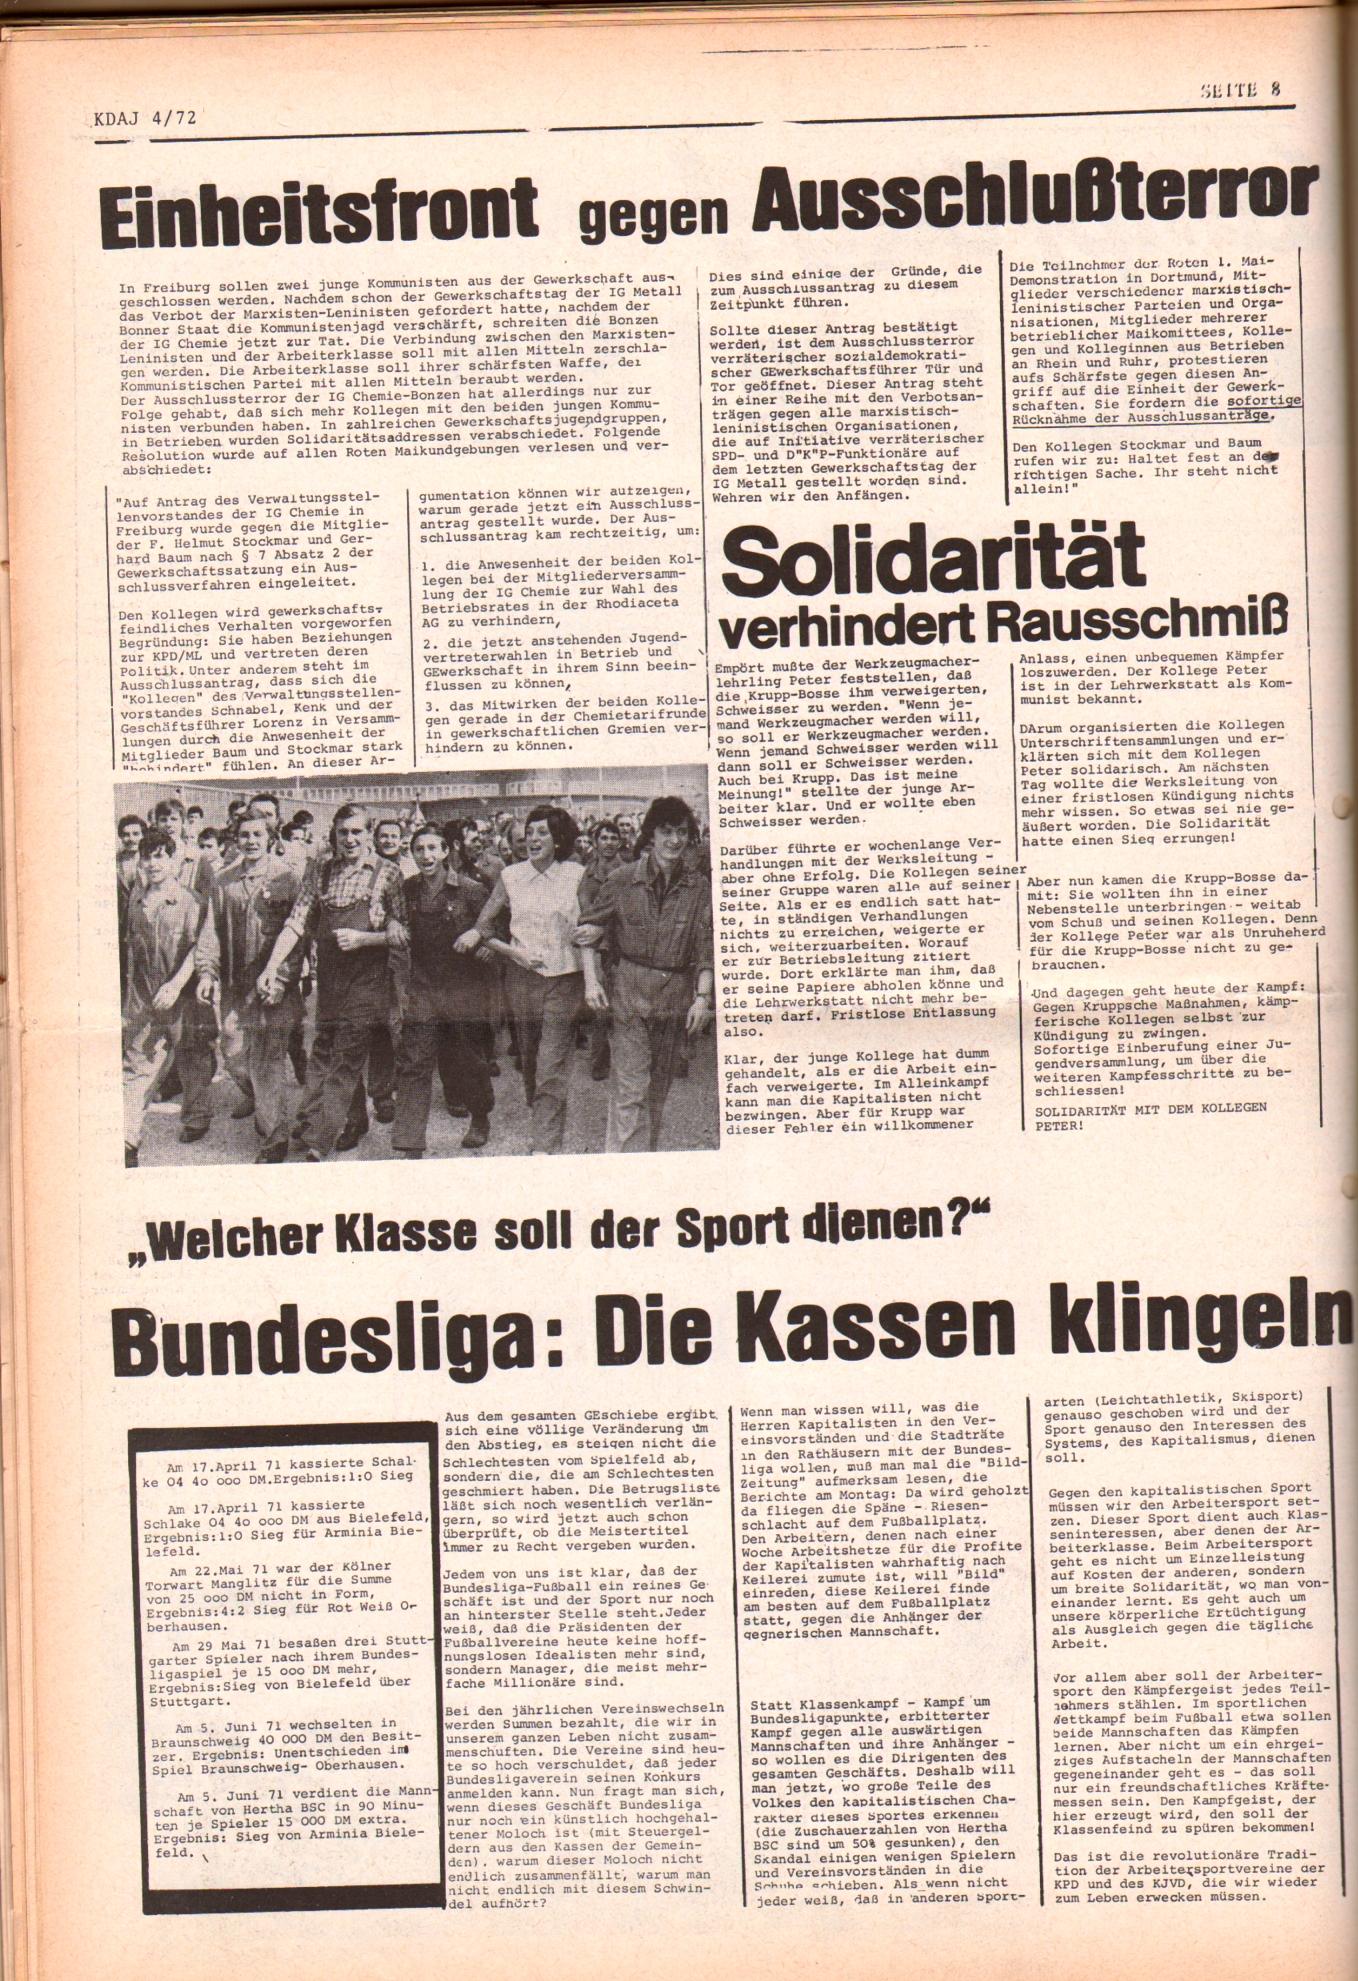 KDAJ, 3. Jg., Mai 1972, Nr. 4, Seite 8